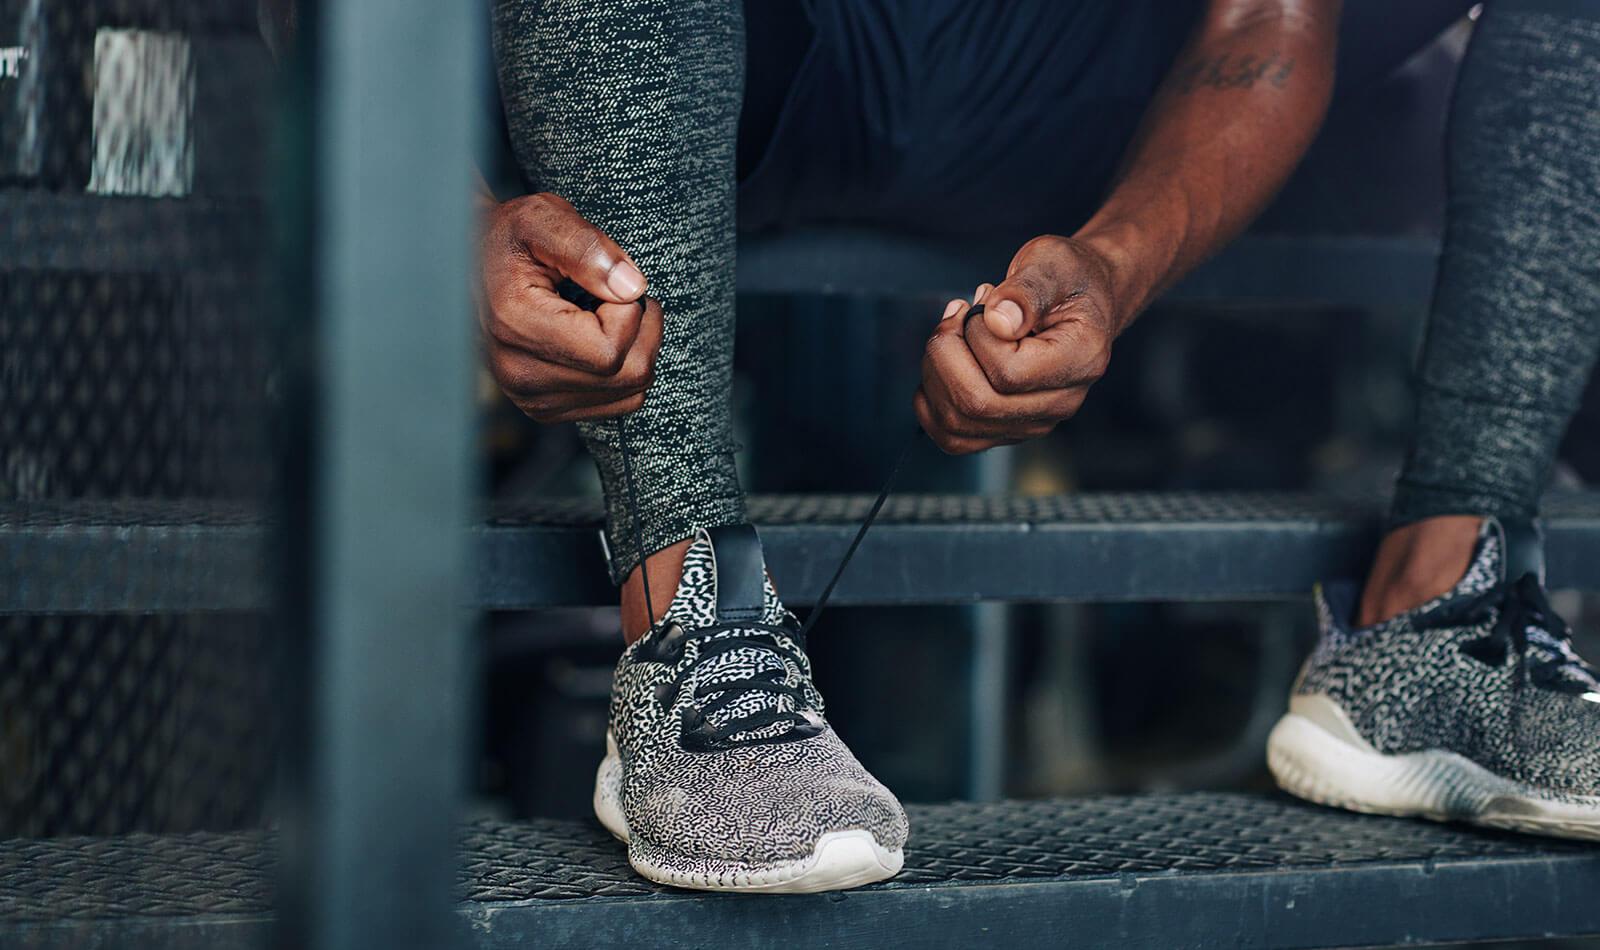 Treatment for Sweaty Feet